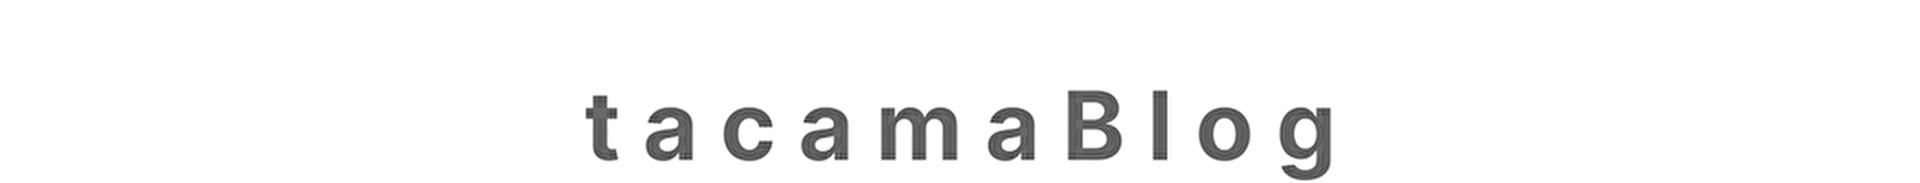 tacamaBlog - ジャズベーシストのブログ